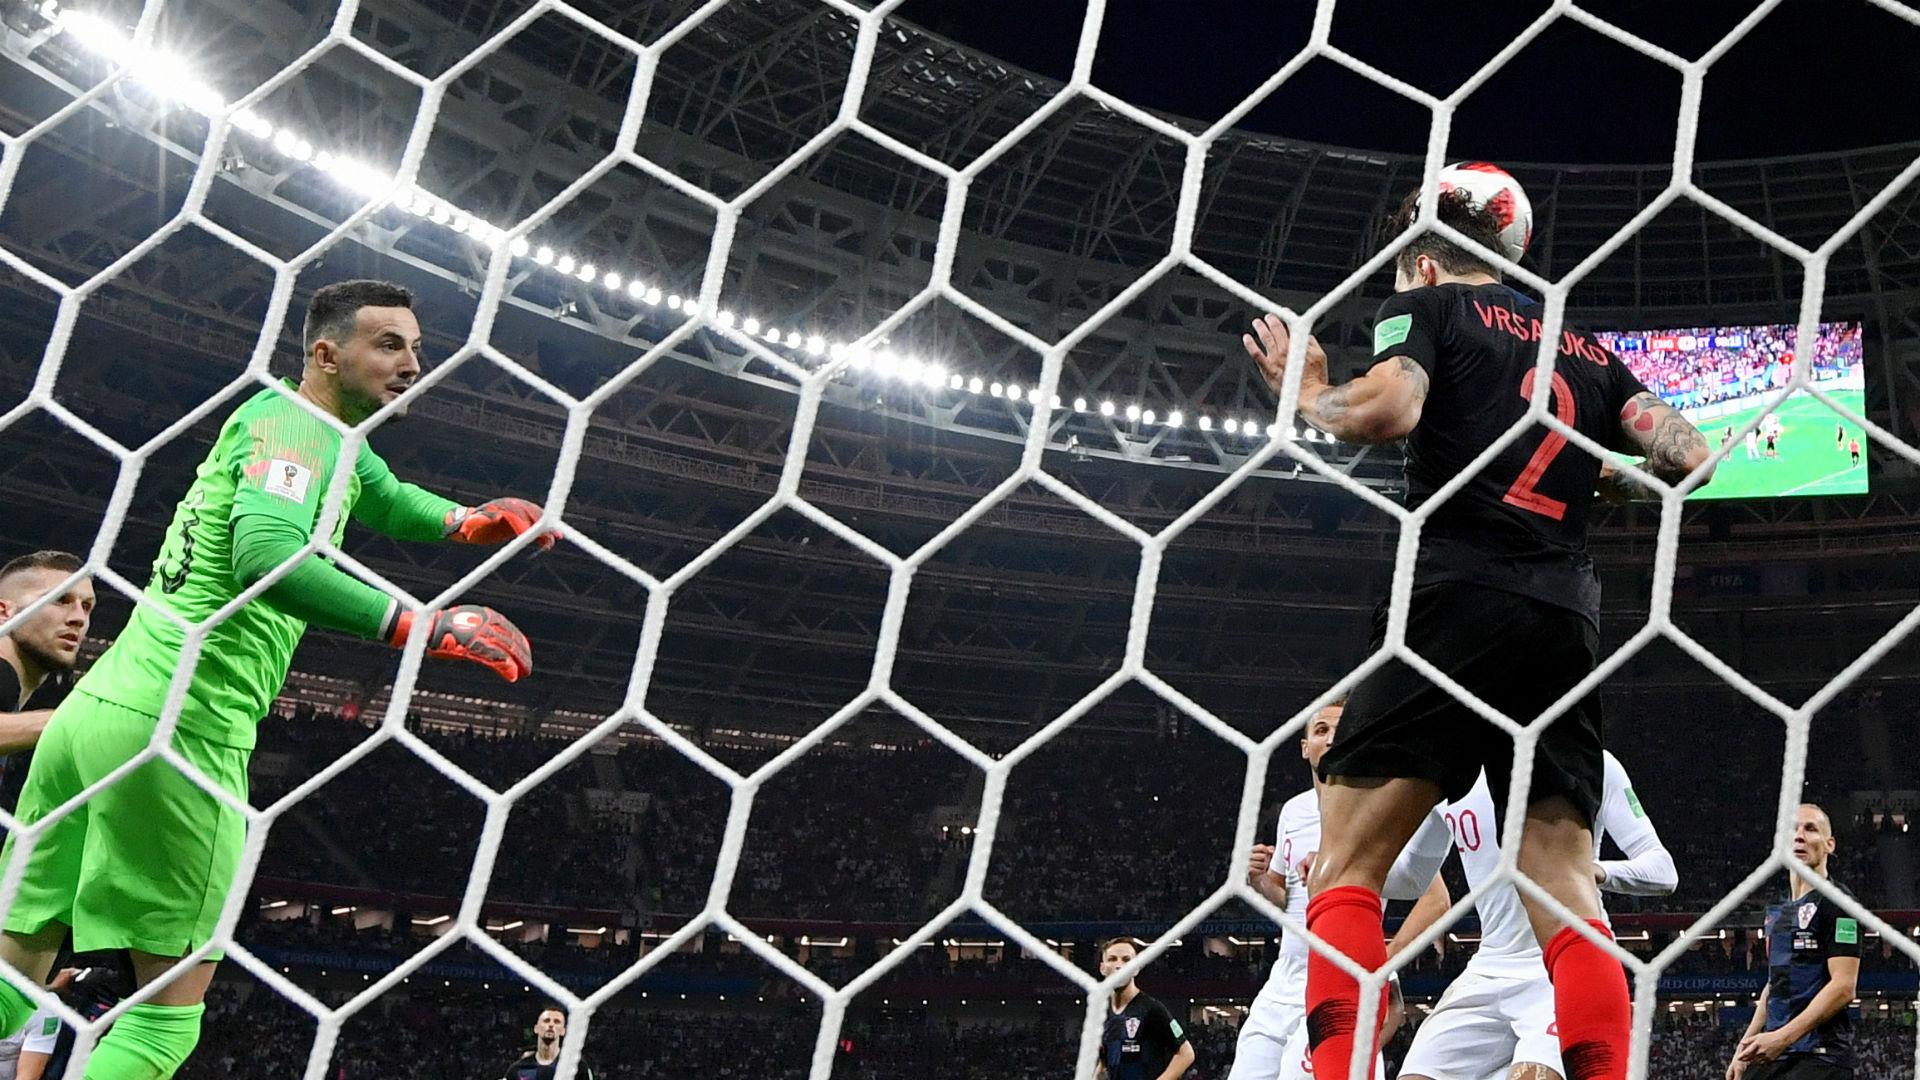 Vrsaljko Inglaterra Croácia Copa do Mundo 11 07 2018